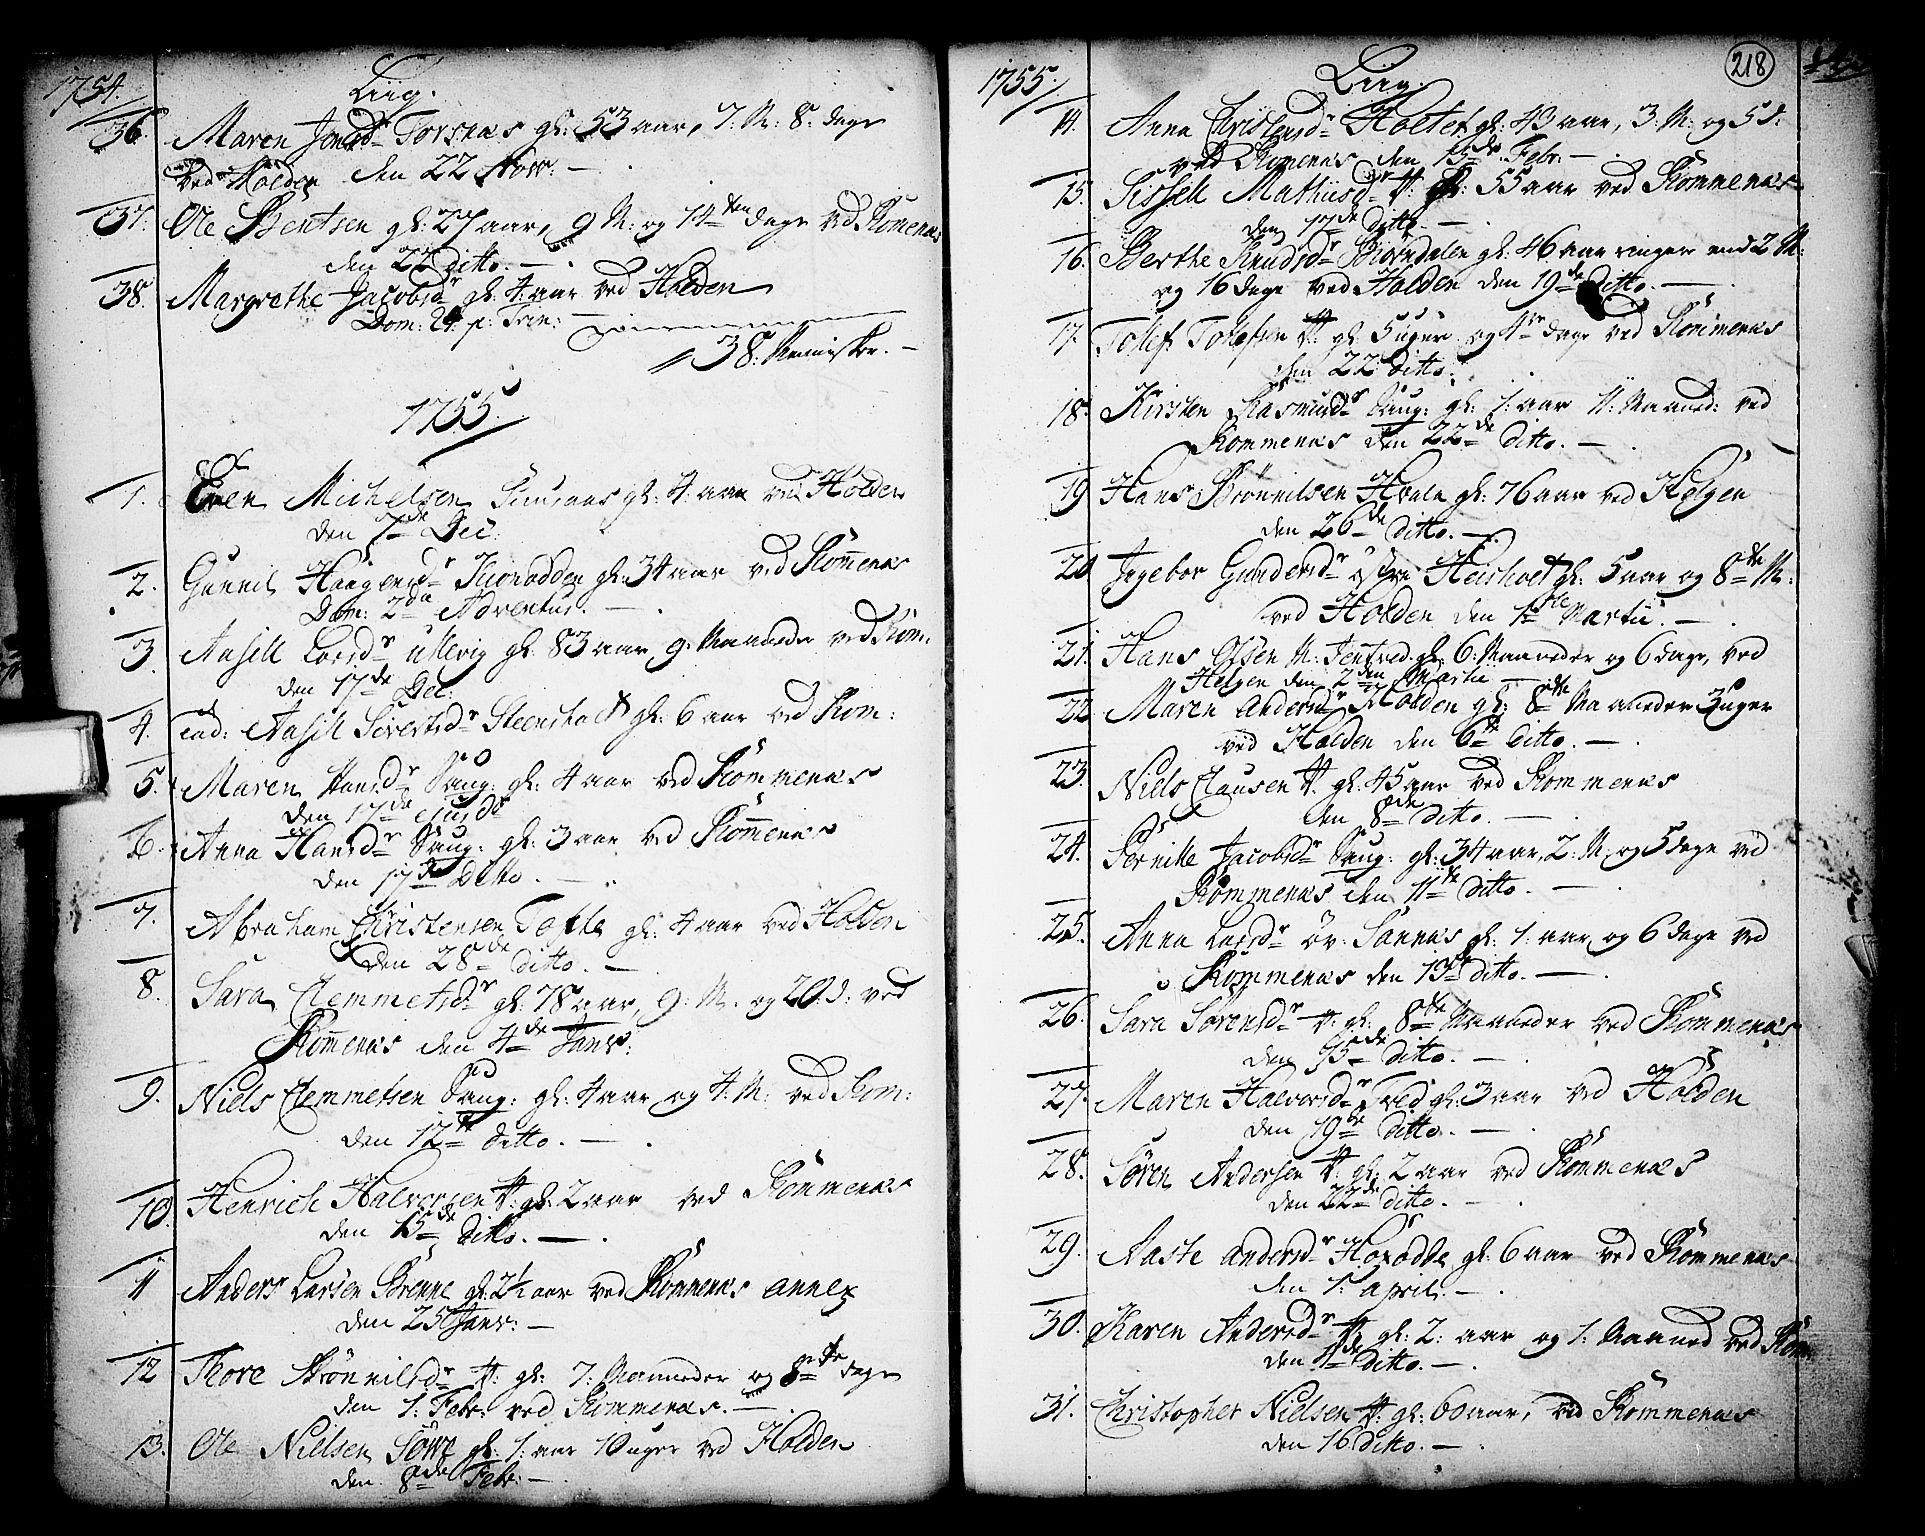 SAKO, Holla kirkebøker, F/Fa/L0001: Ministerialbok nr. 1, 1717-1779, s. 218